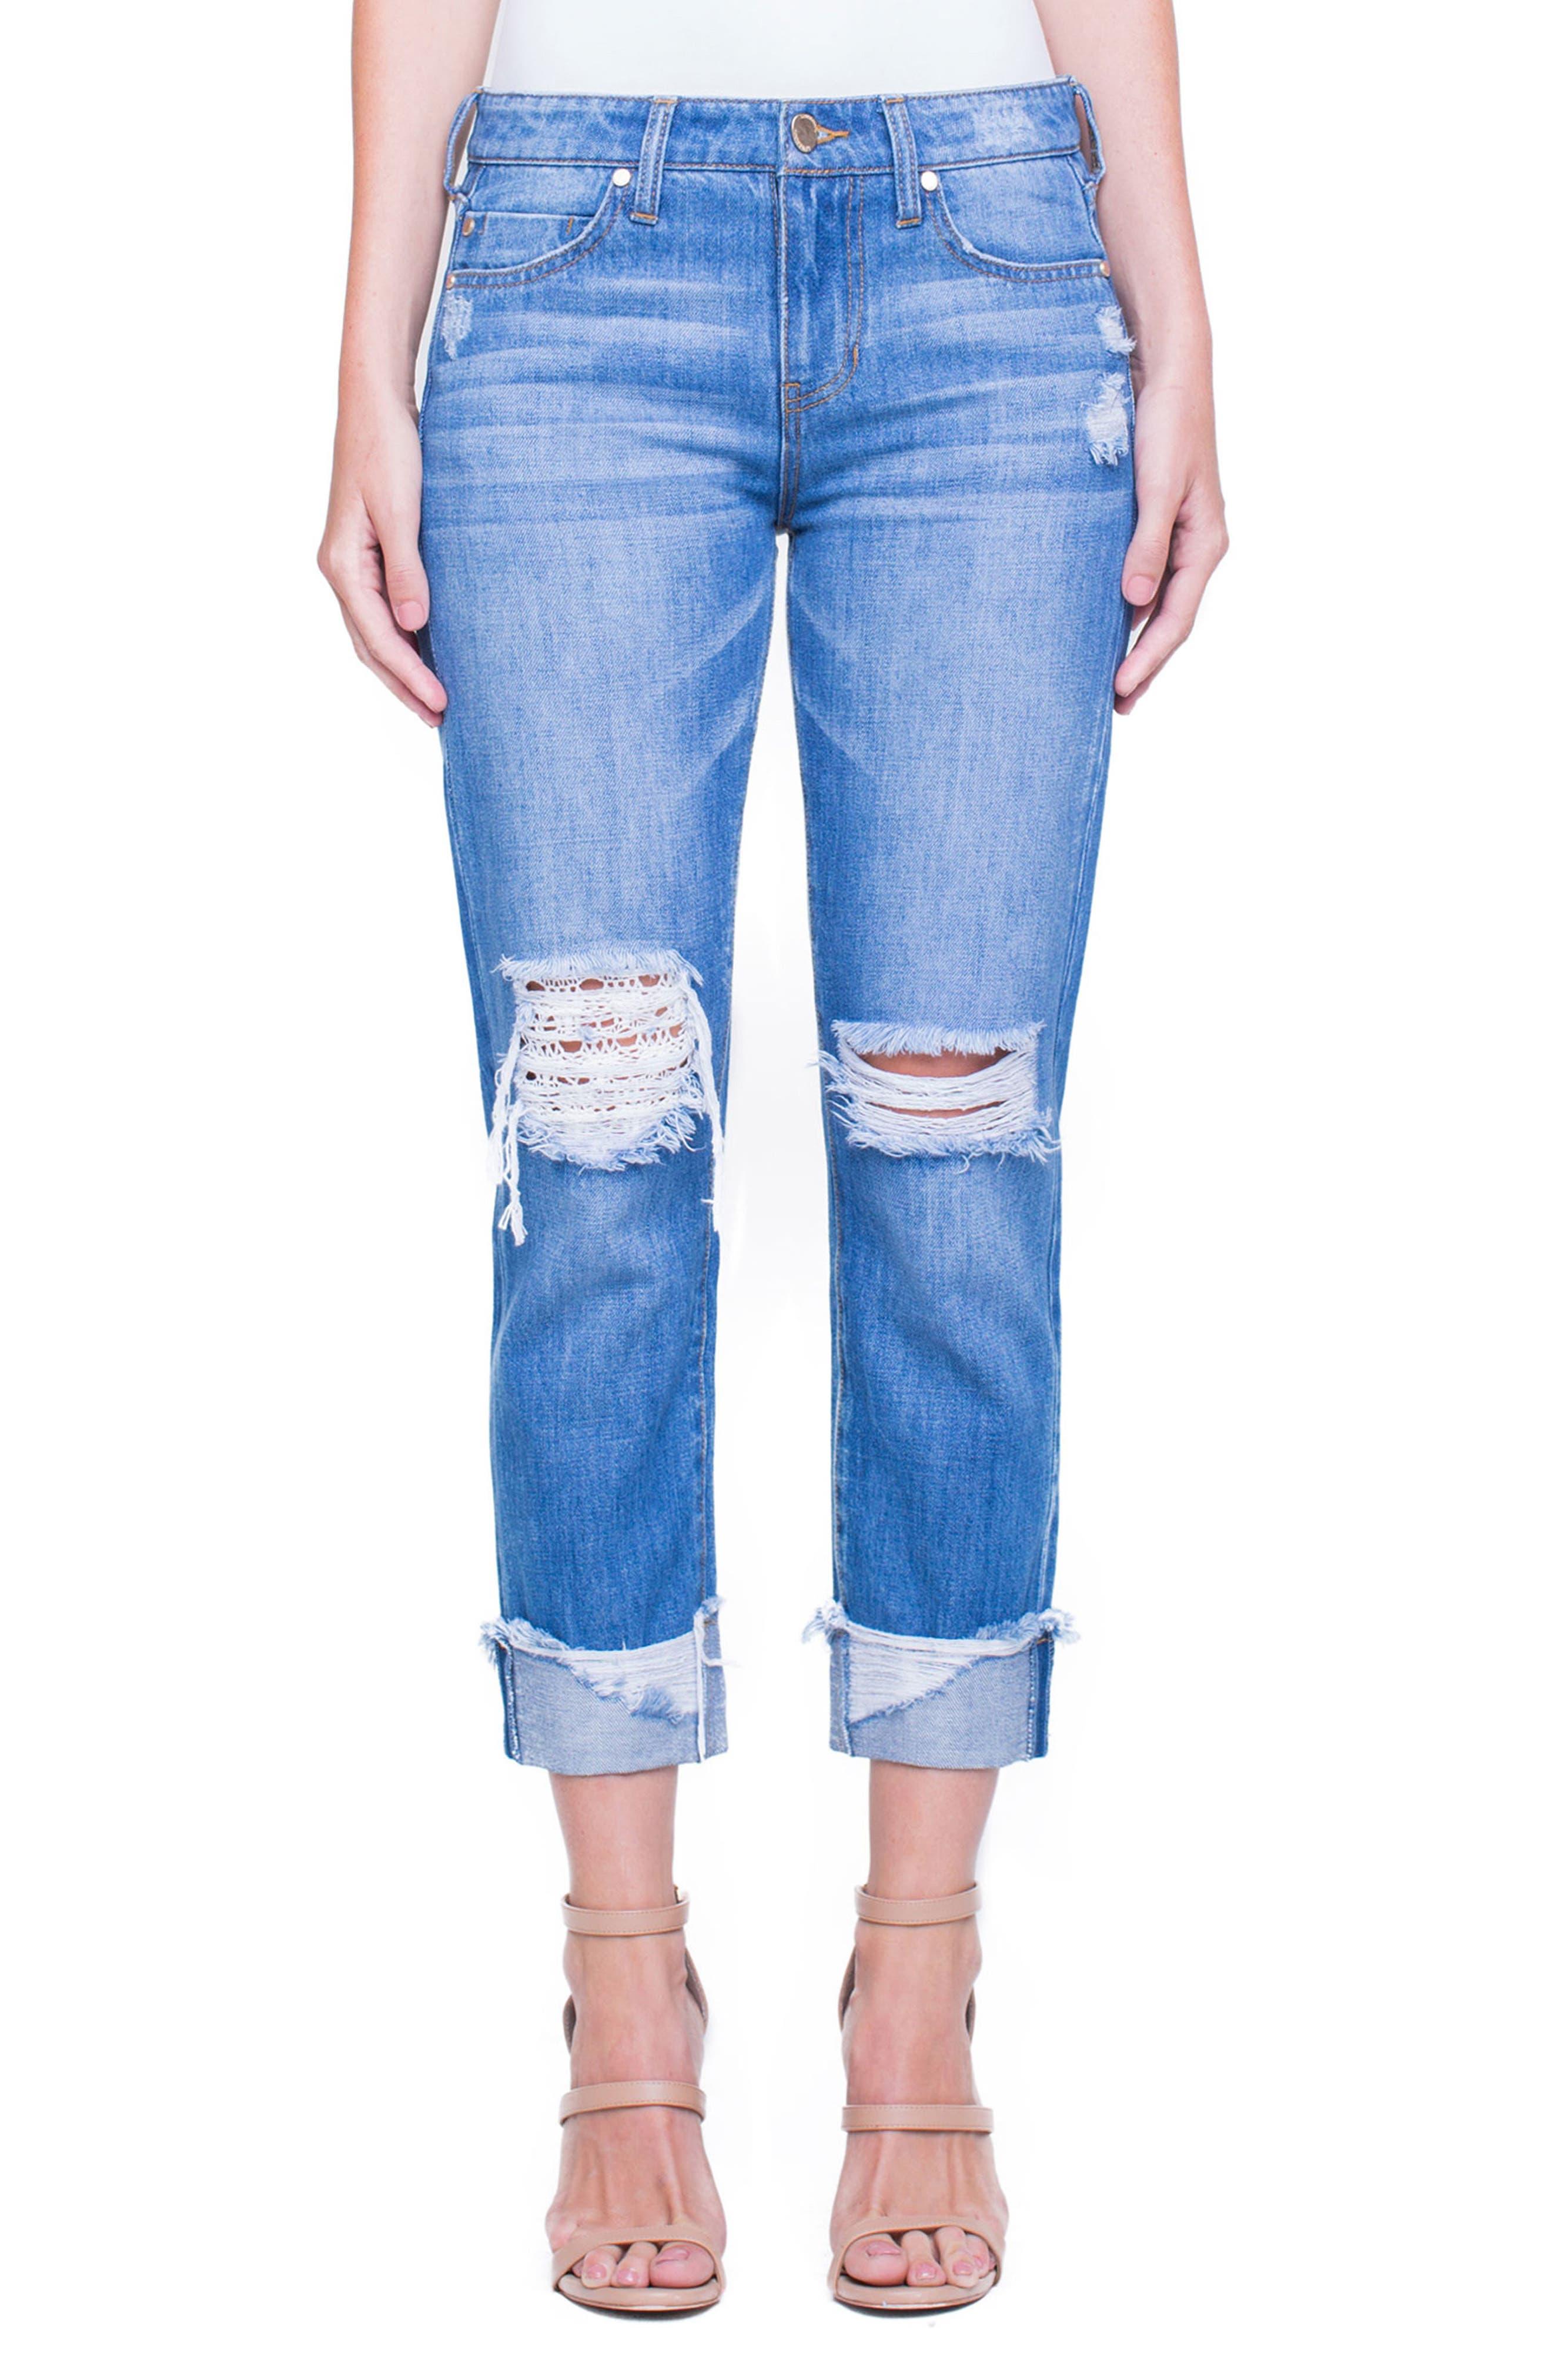 Jeans Company Kennedy Distressed Raw Hem Crop Boyfriend Jeans,                         Main,                         color, 402